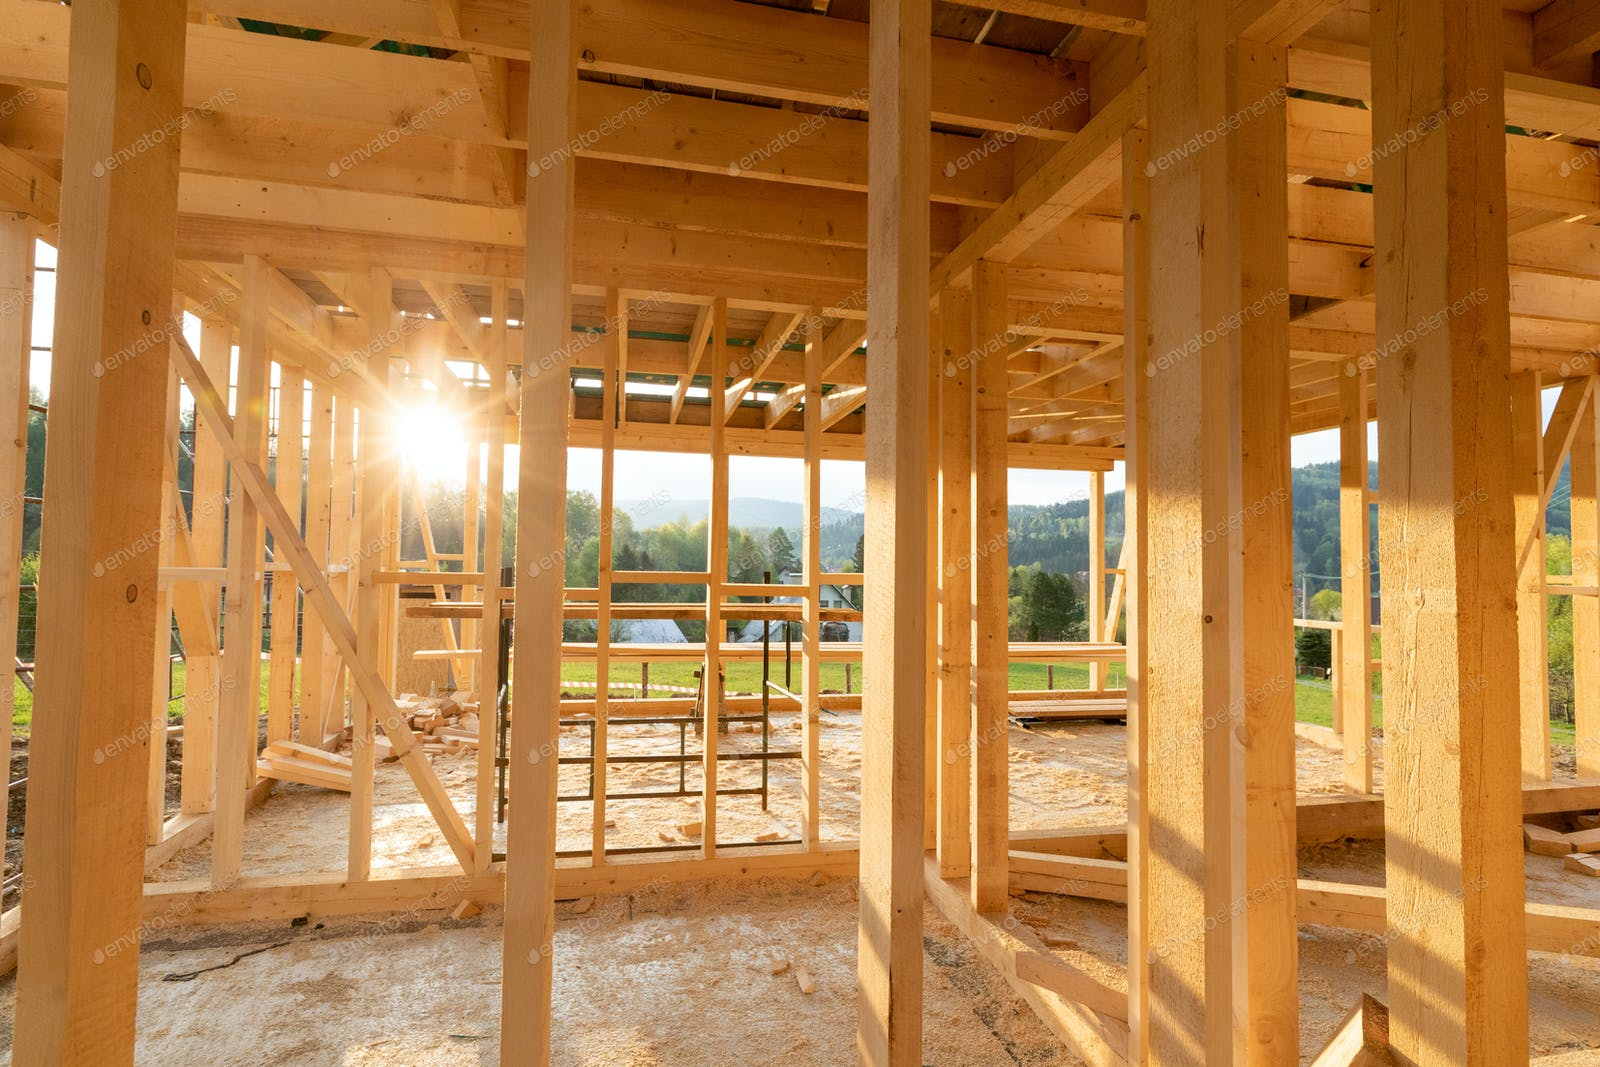 Ten Ways To Help Your Construction Business Flourish